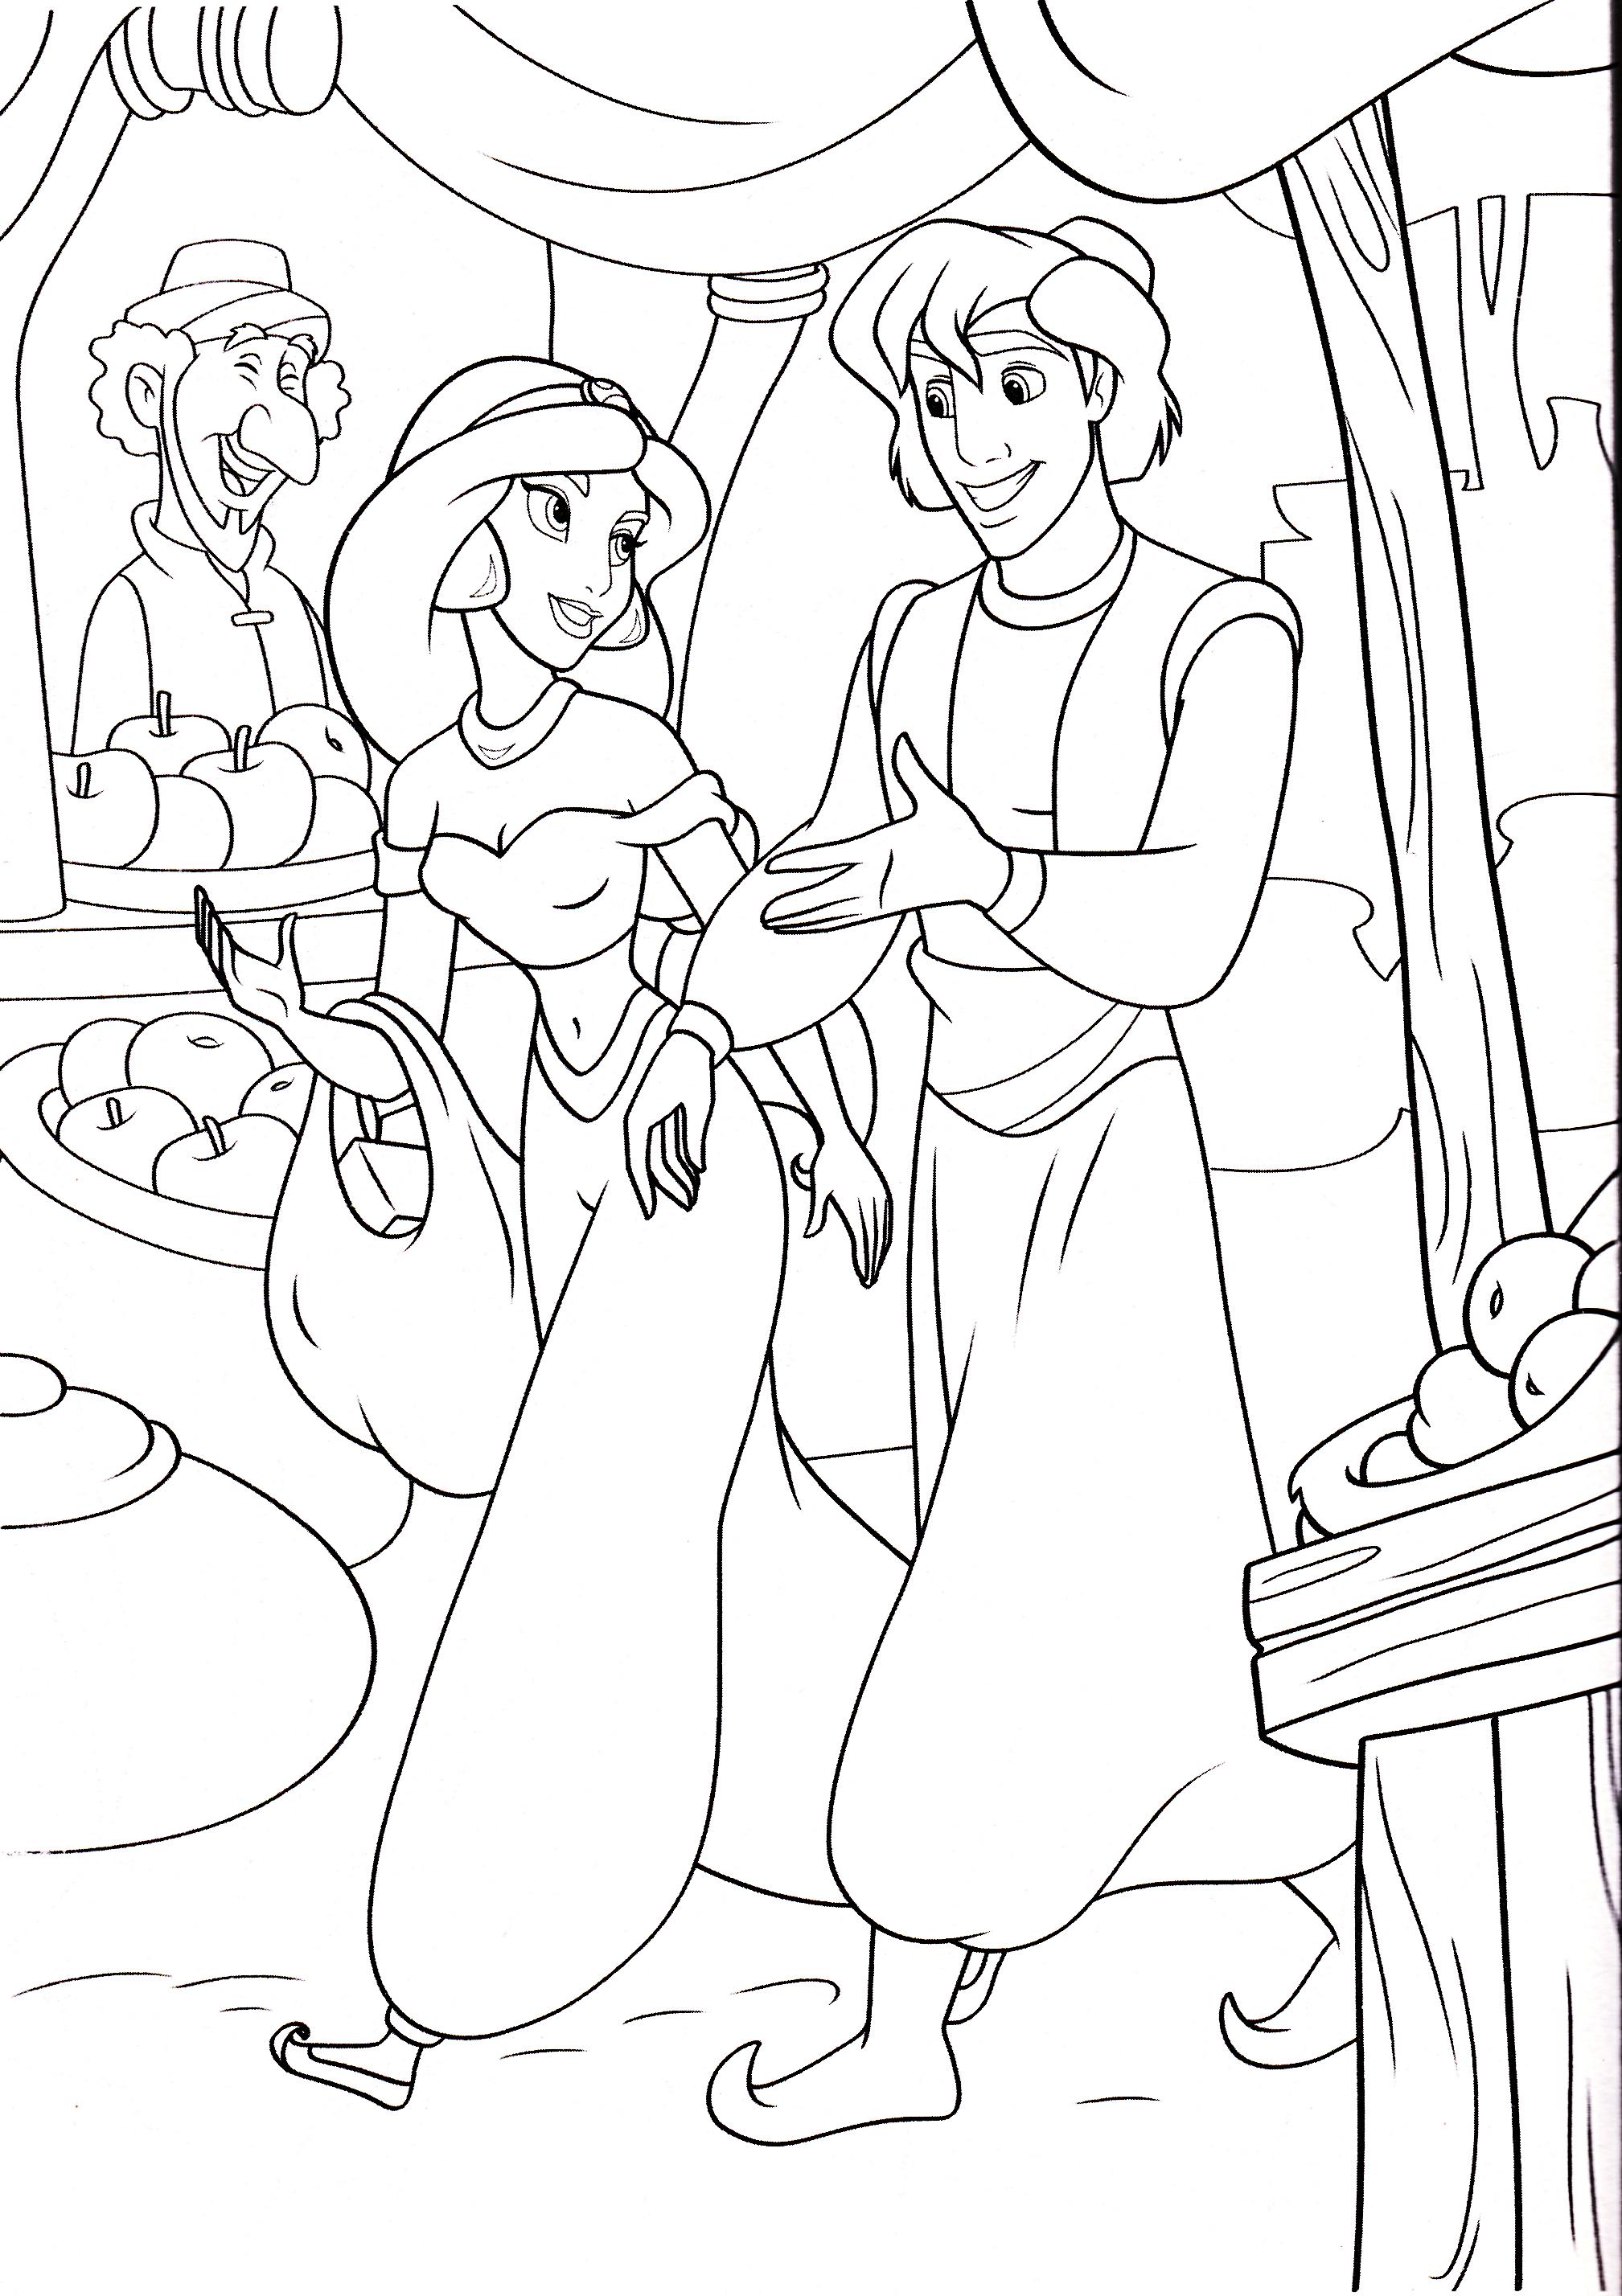 Walt Disney Coloring Pages - Princess Jasmine & Prince Aladdin